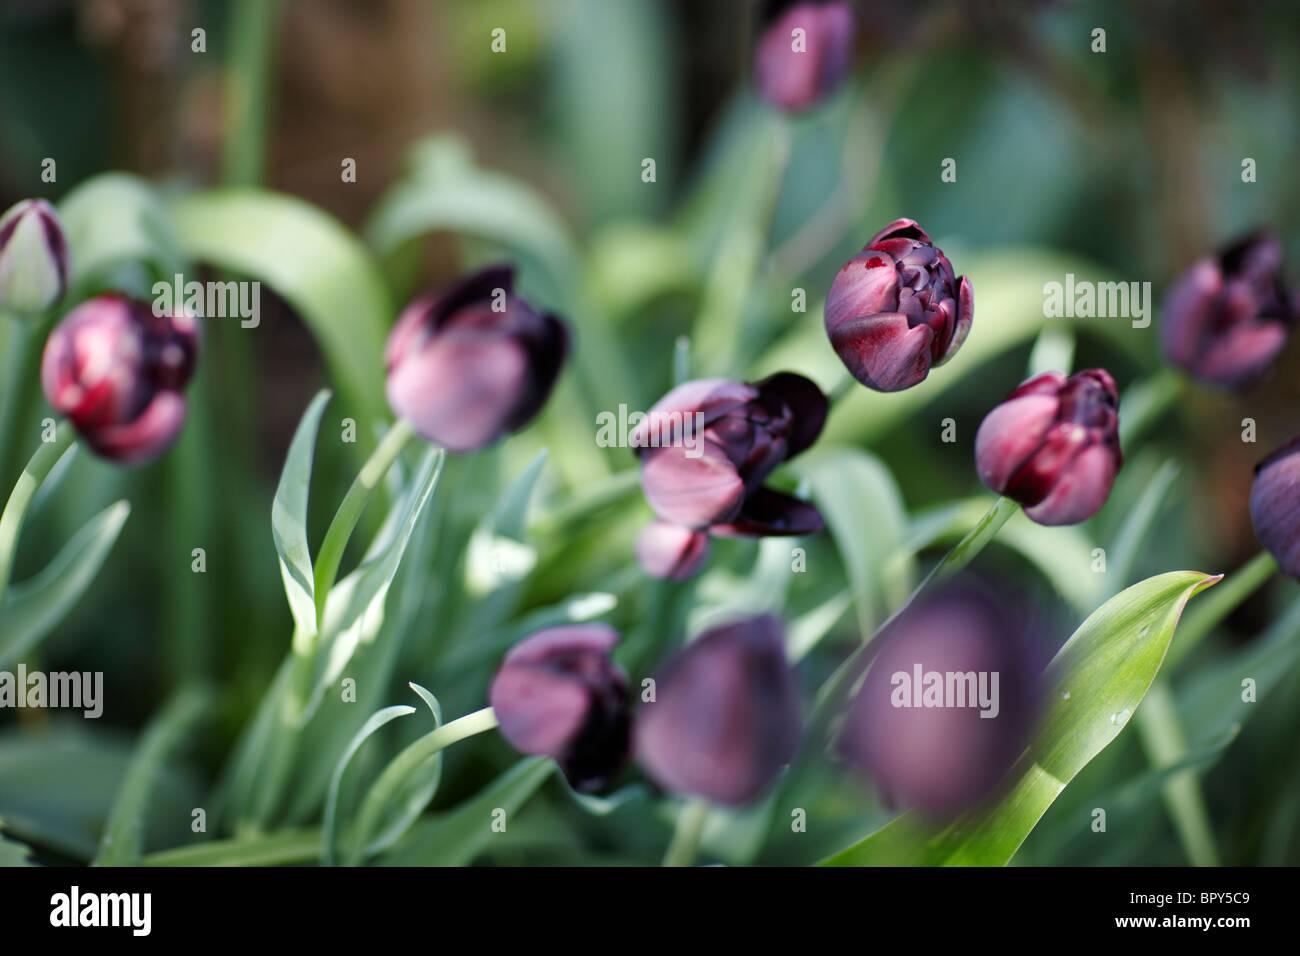 schwarz violette tulpen stockfoto bild 31329769 alamy. Black Bedroom Furniture Sets. Home Design Ideas